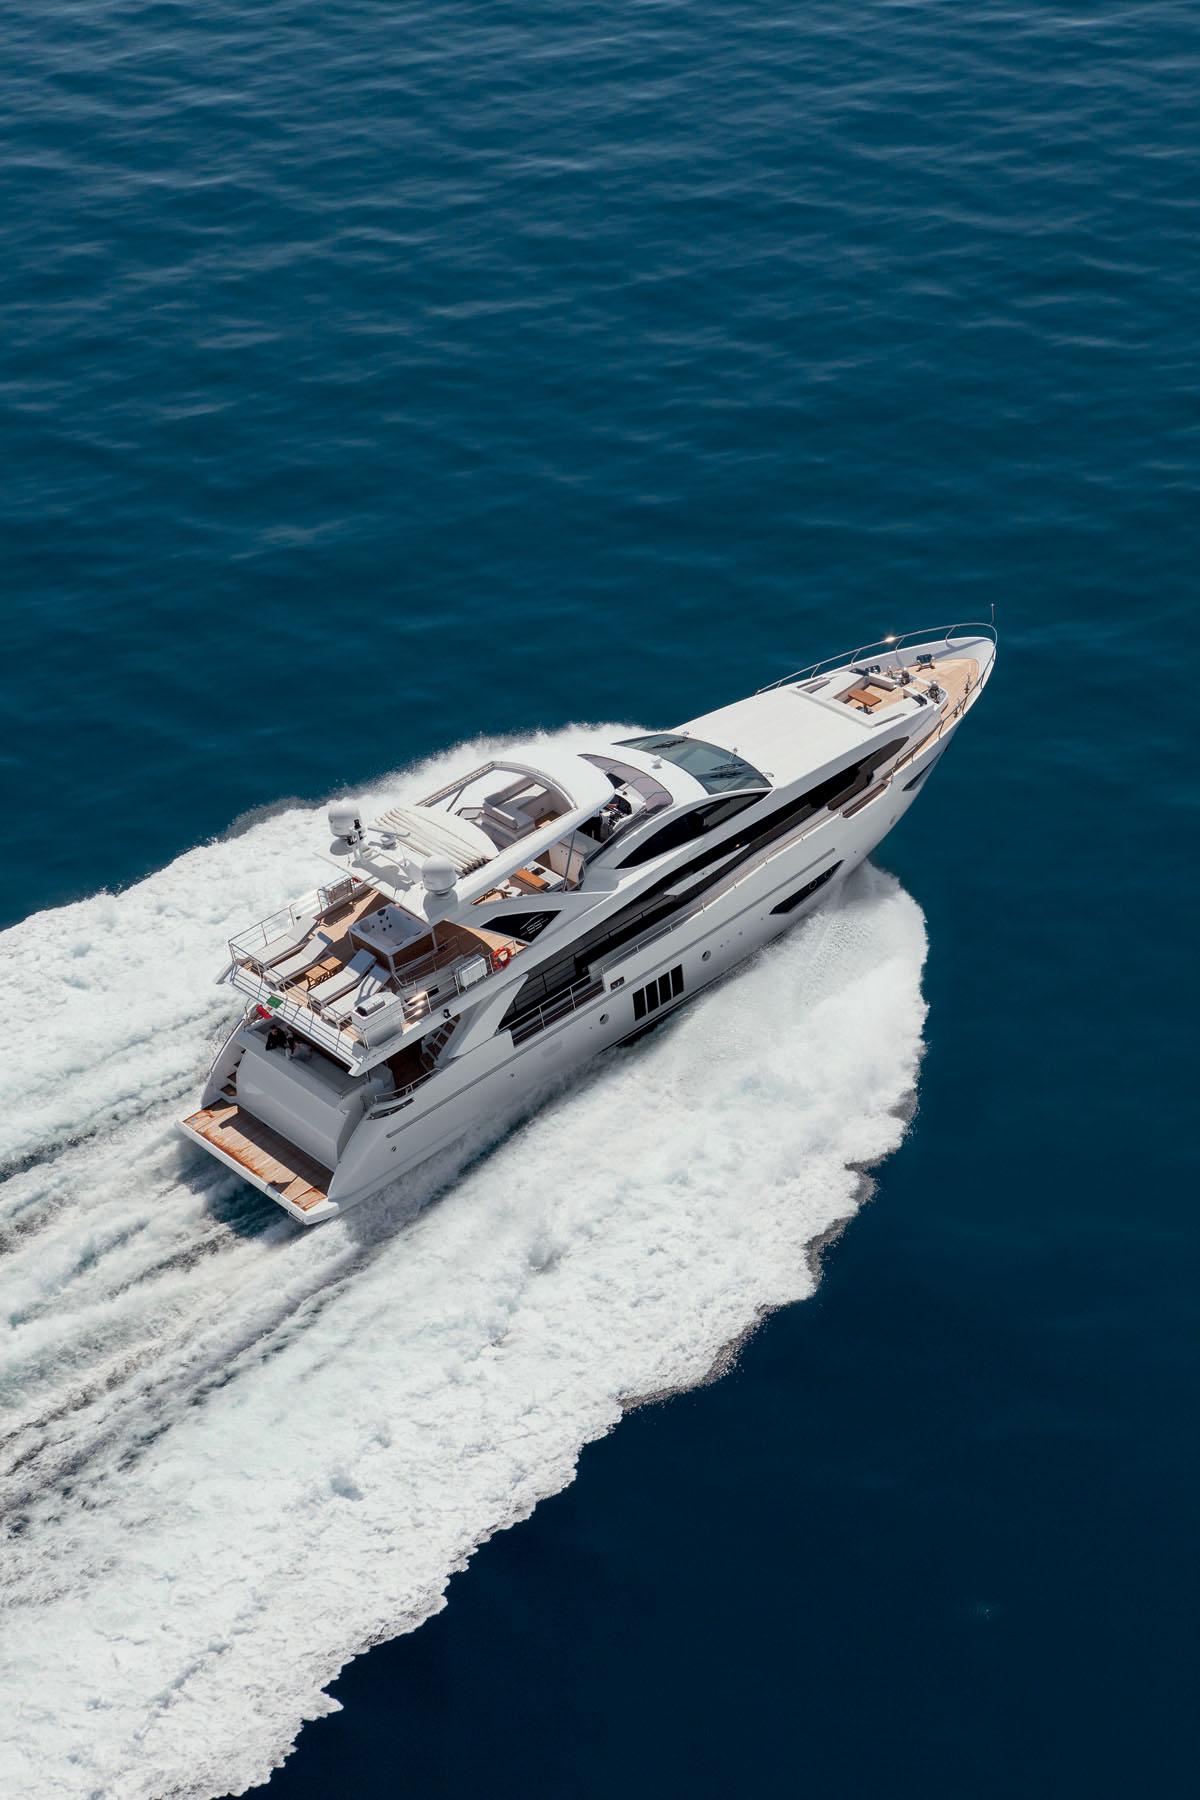 95 Rph Jonacor Marine